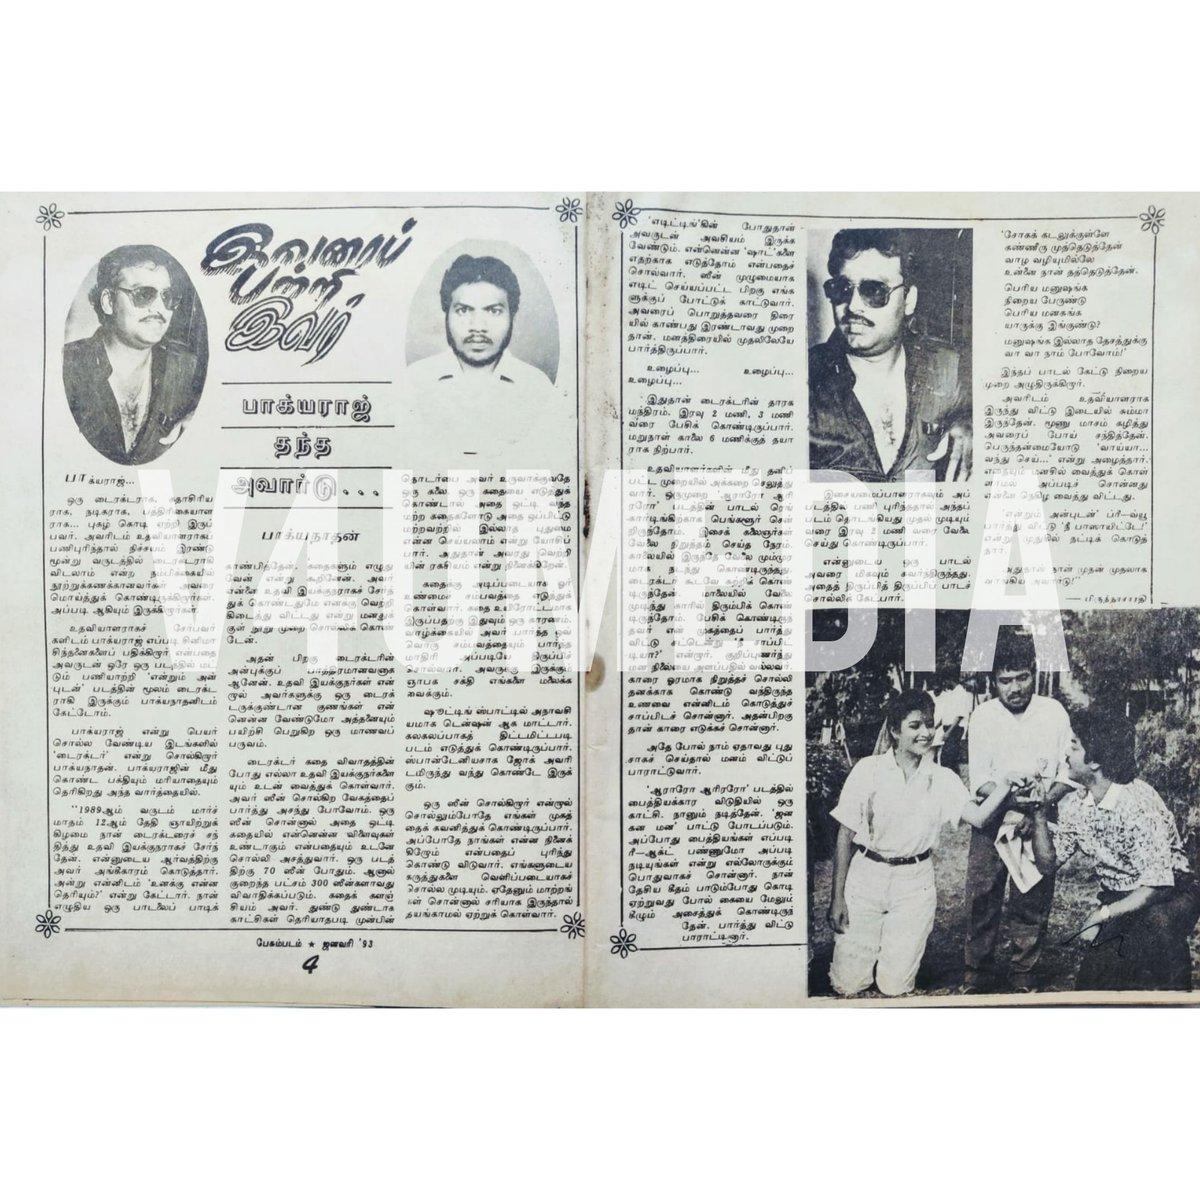 #RevisitingWithRiaz Day-21  #PesumPadam- January 1993  @ungalKBhagyaraj @brindasarathi @Atharvaamurali #HeeraRajagopal #Murali   #nostalgic #Nostalgia #gallery #memories #Flashback #Throwback #TBT #ThrowbackThursday   @V4umedia_ https://t.co/ClM0iPHgw7